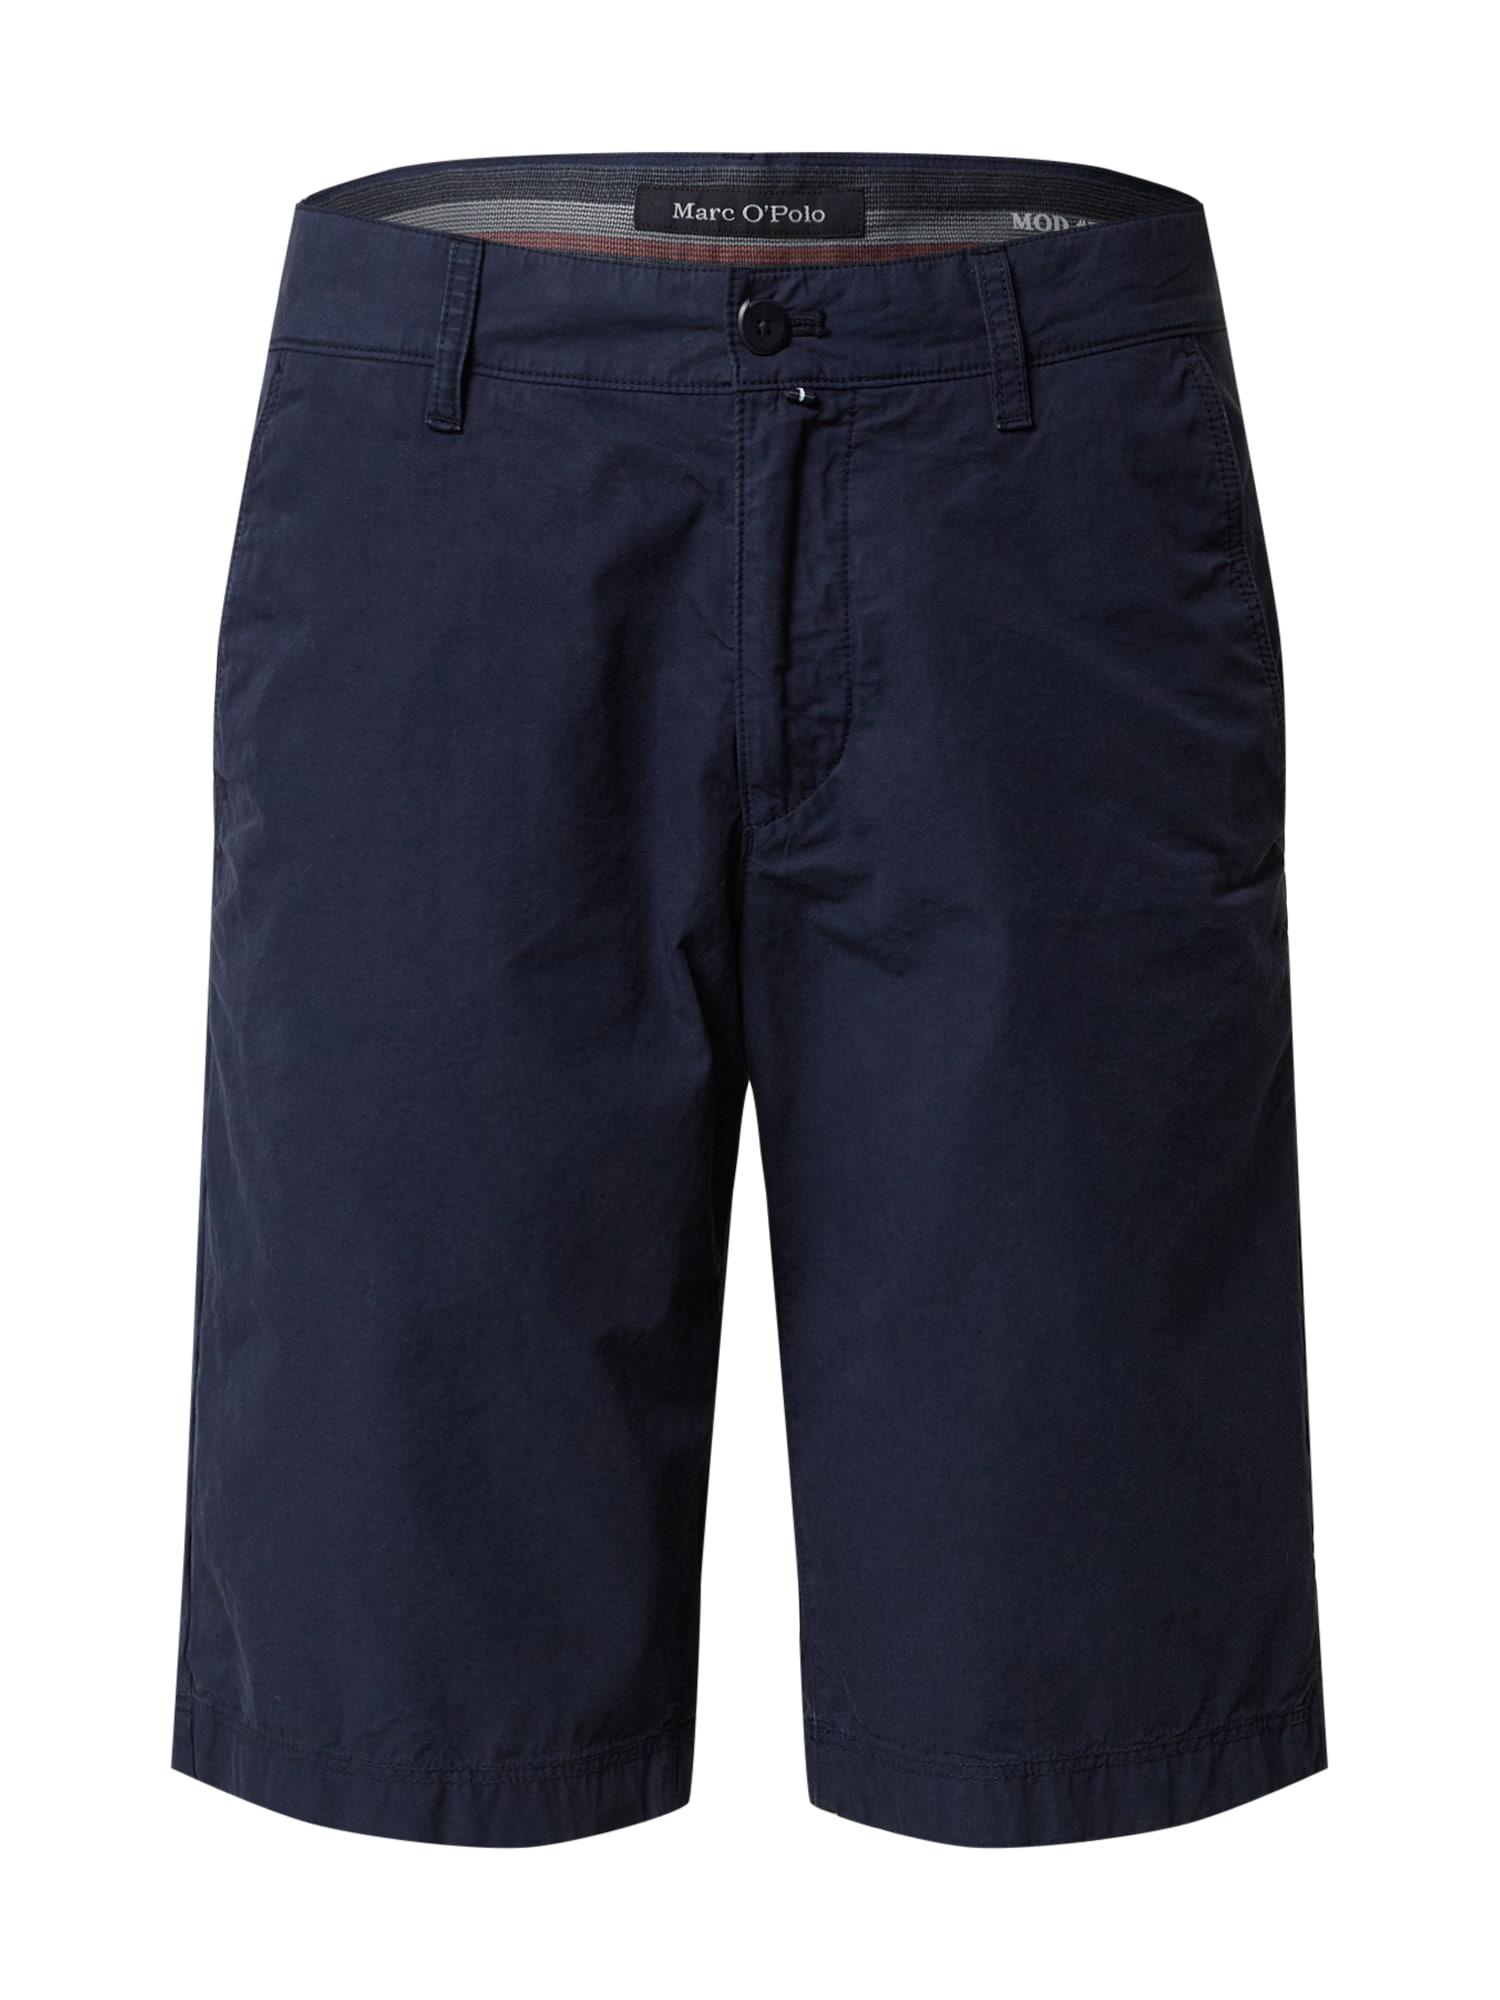 "Marc O'Polo ""Chino"" stiliaus kelnės 'Reso' tamsiai mėlyna"